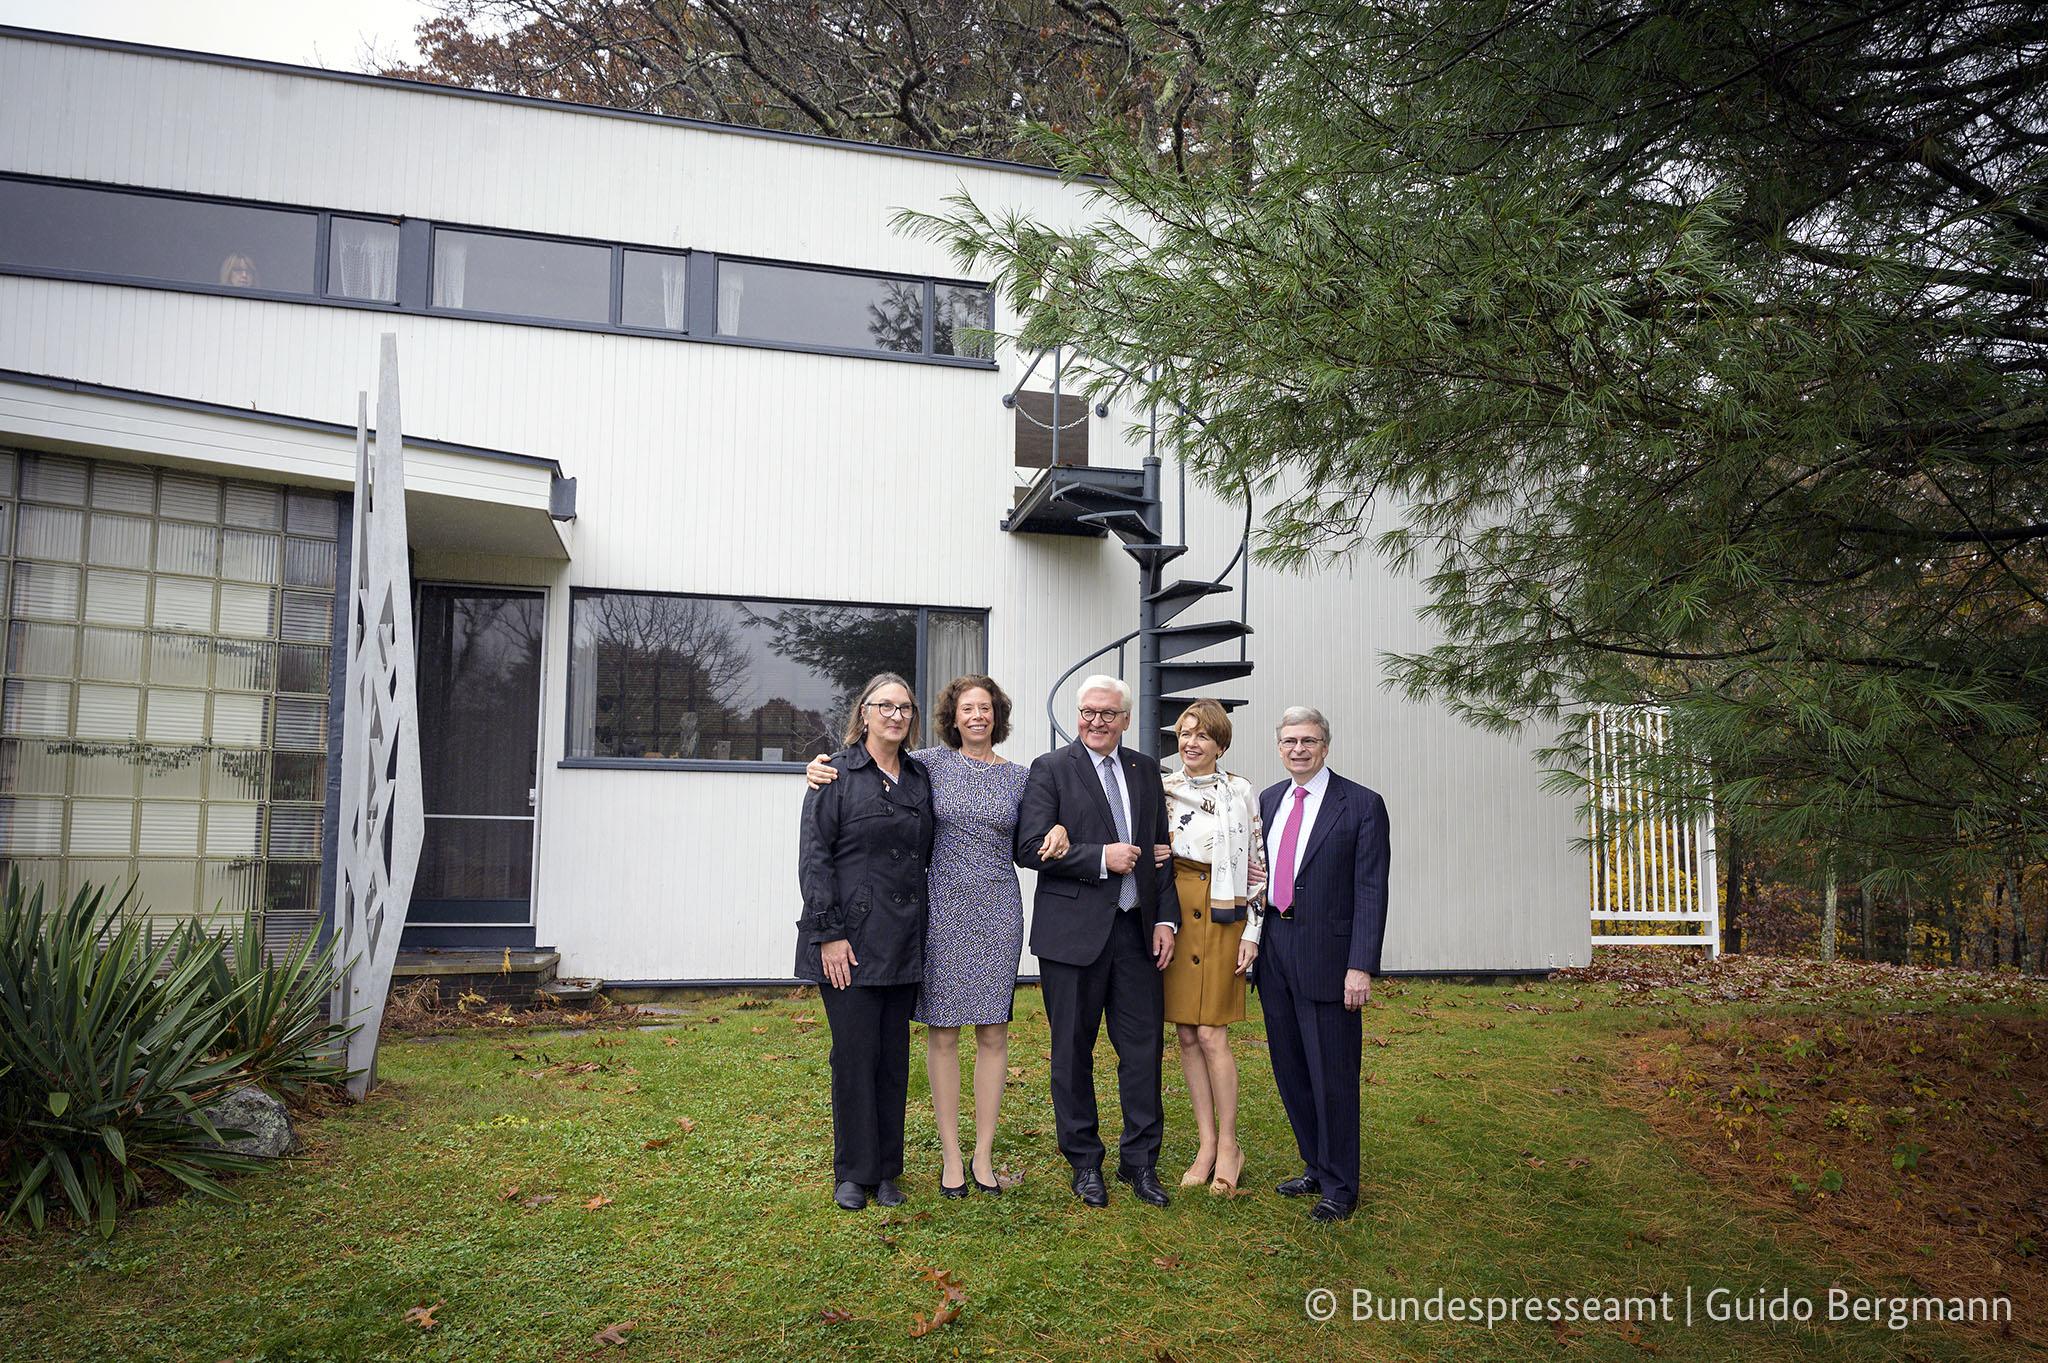 Wendy Hubbard, Erika Pfammatter, German President Frank-Walter Steinmeier, Elke Budenbender, and Carl R. Nold